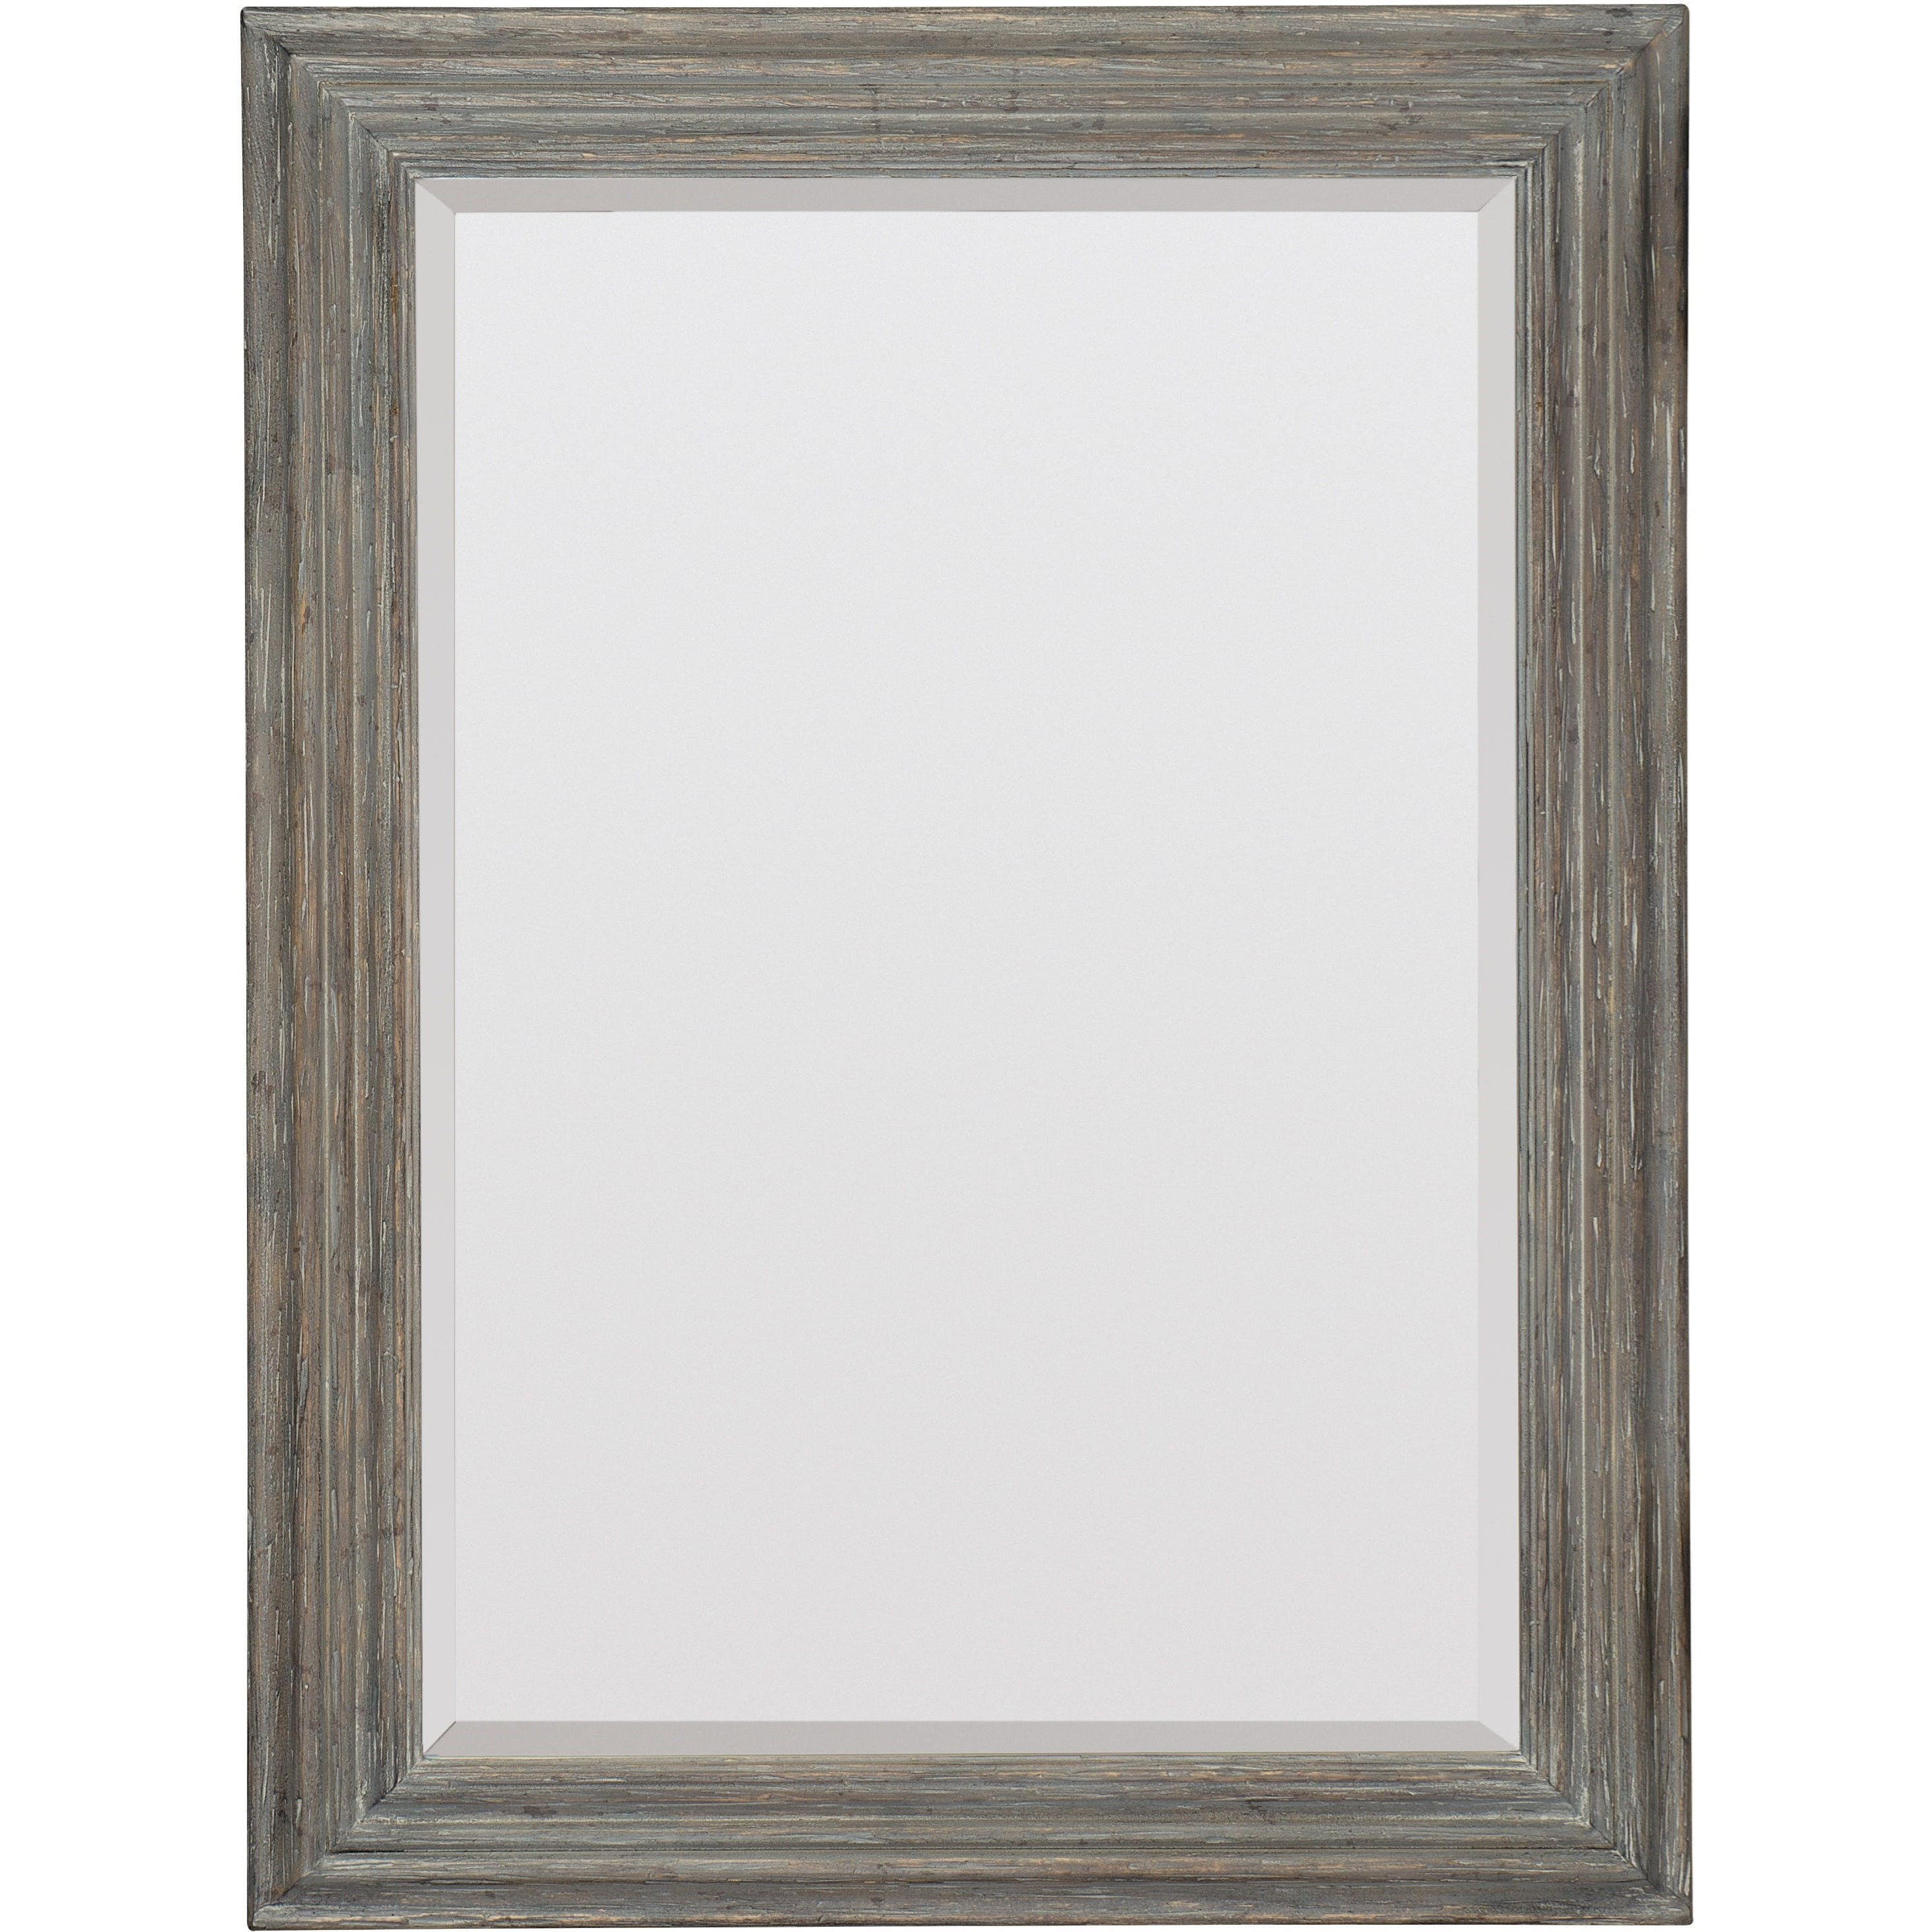 Beaumont Landscape Mirror by Hooker Furniture at Baer's Furniture